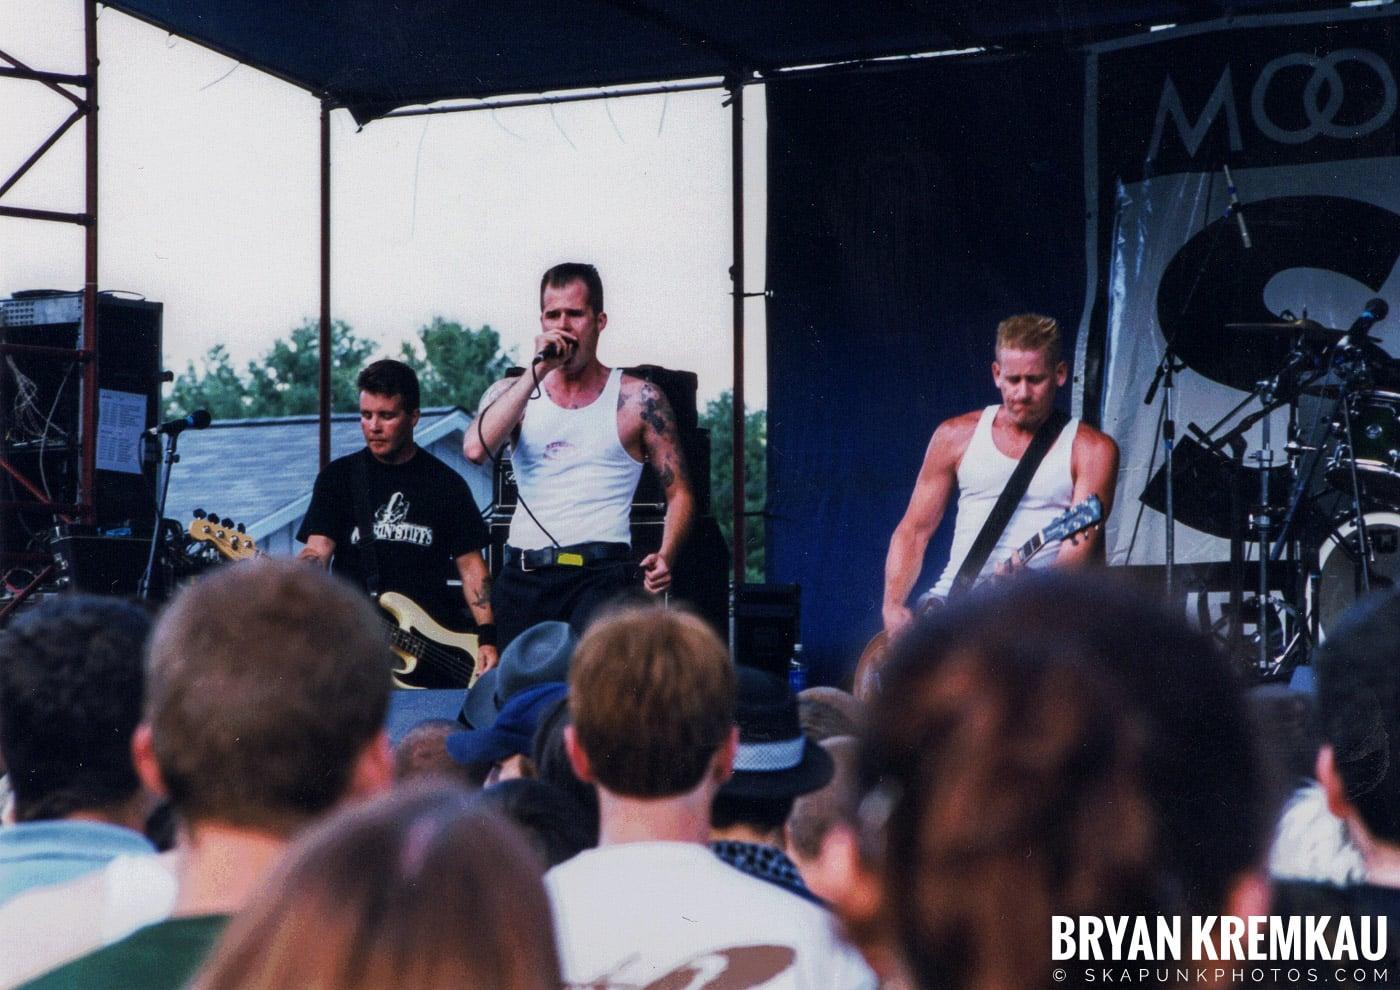 The Dropkick Murphys @ New England Ska Fest 98, Westford, MA - 8.22.98 (8)